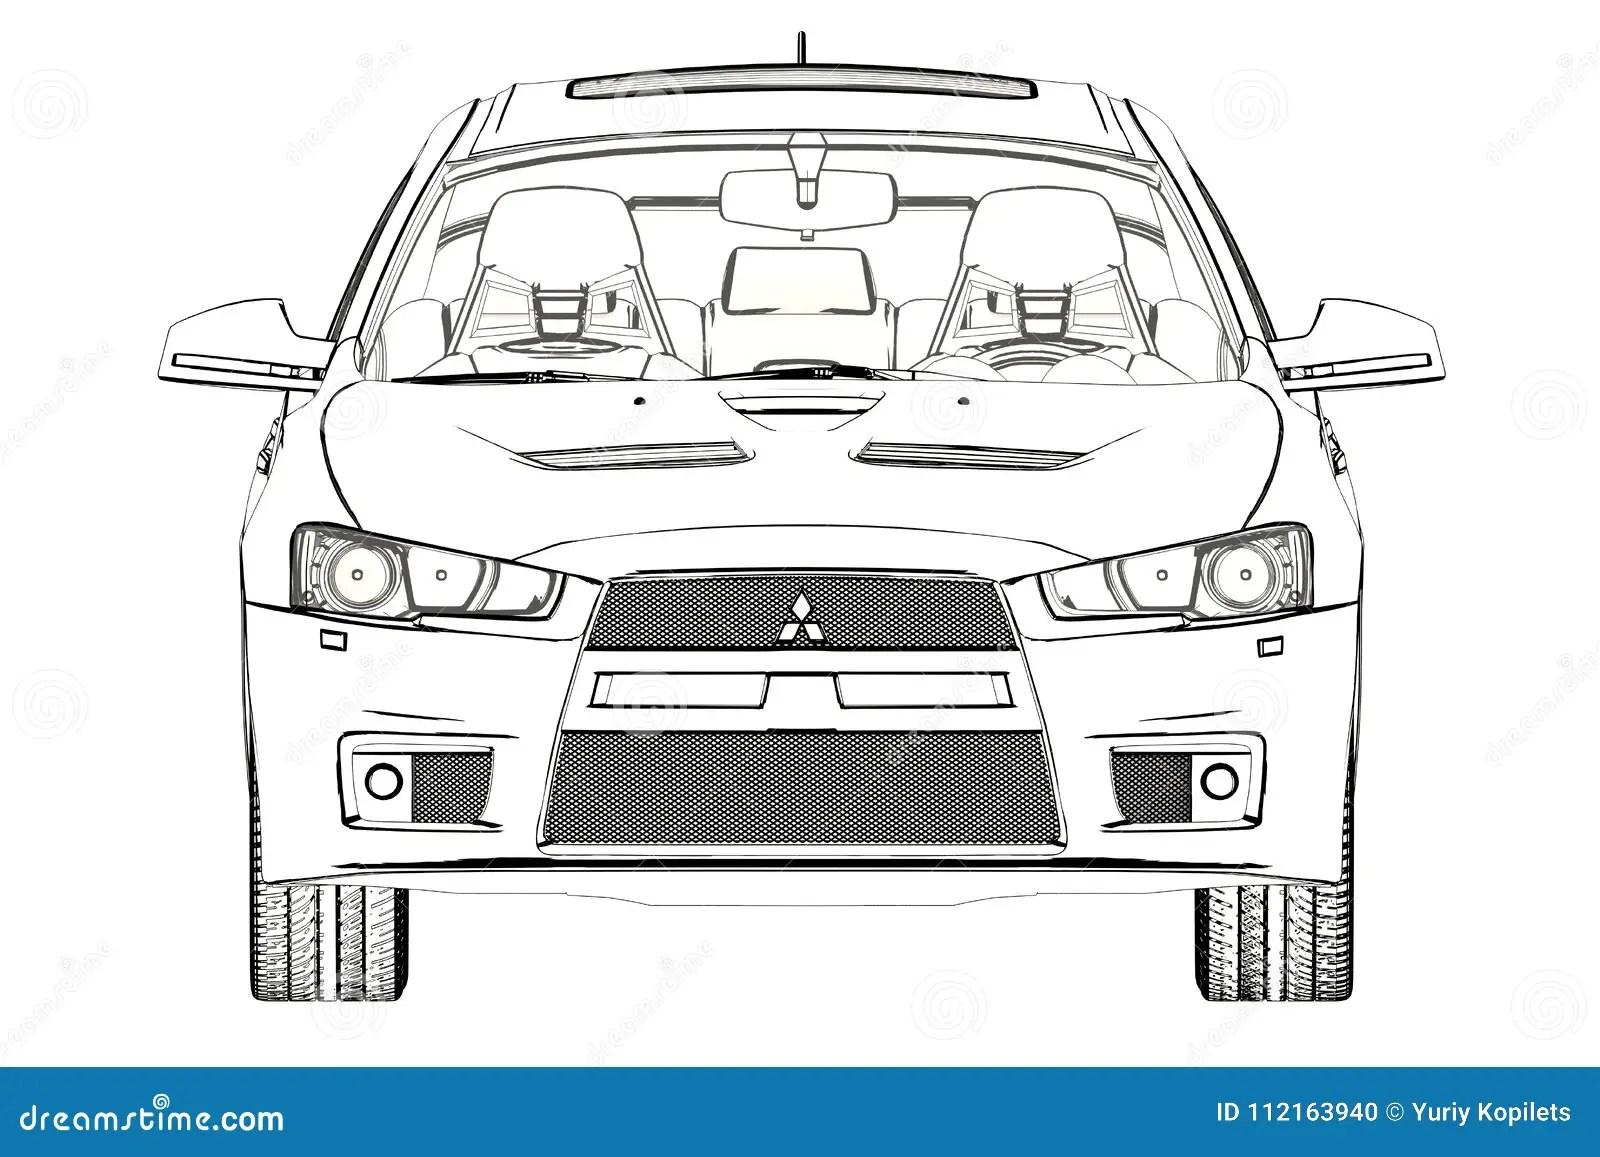 Sedan Mitsubishi Evolution X Sketch. 3D Illustration